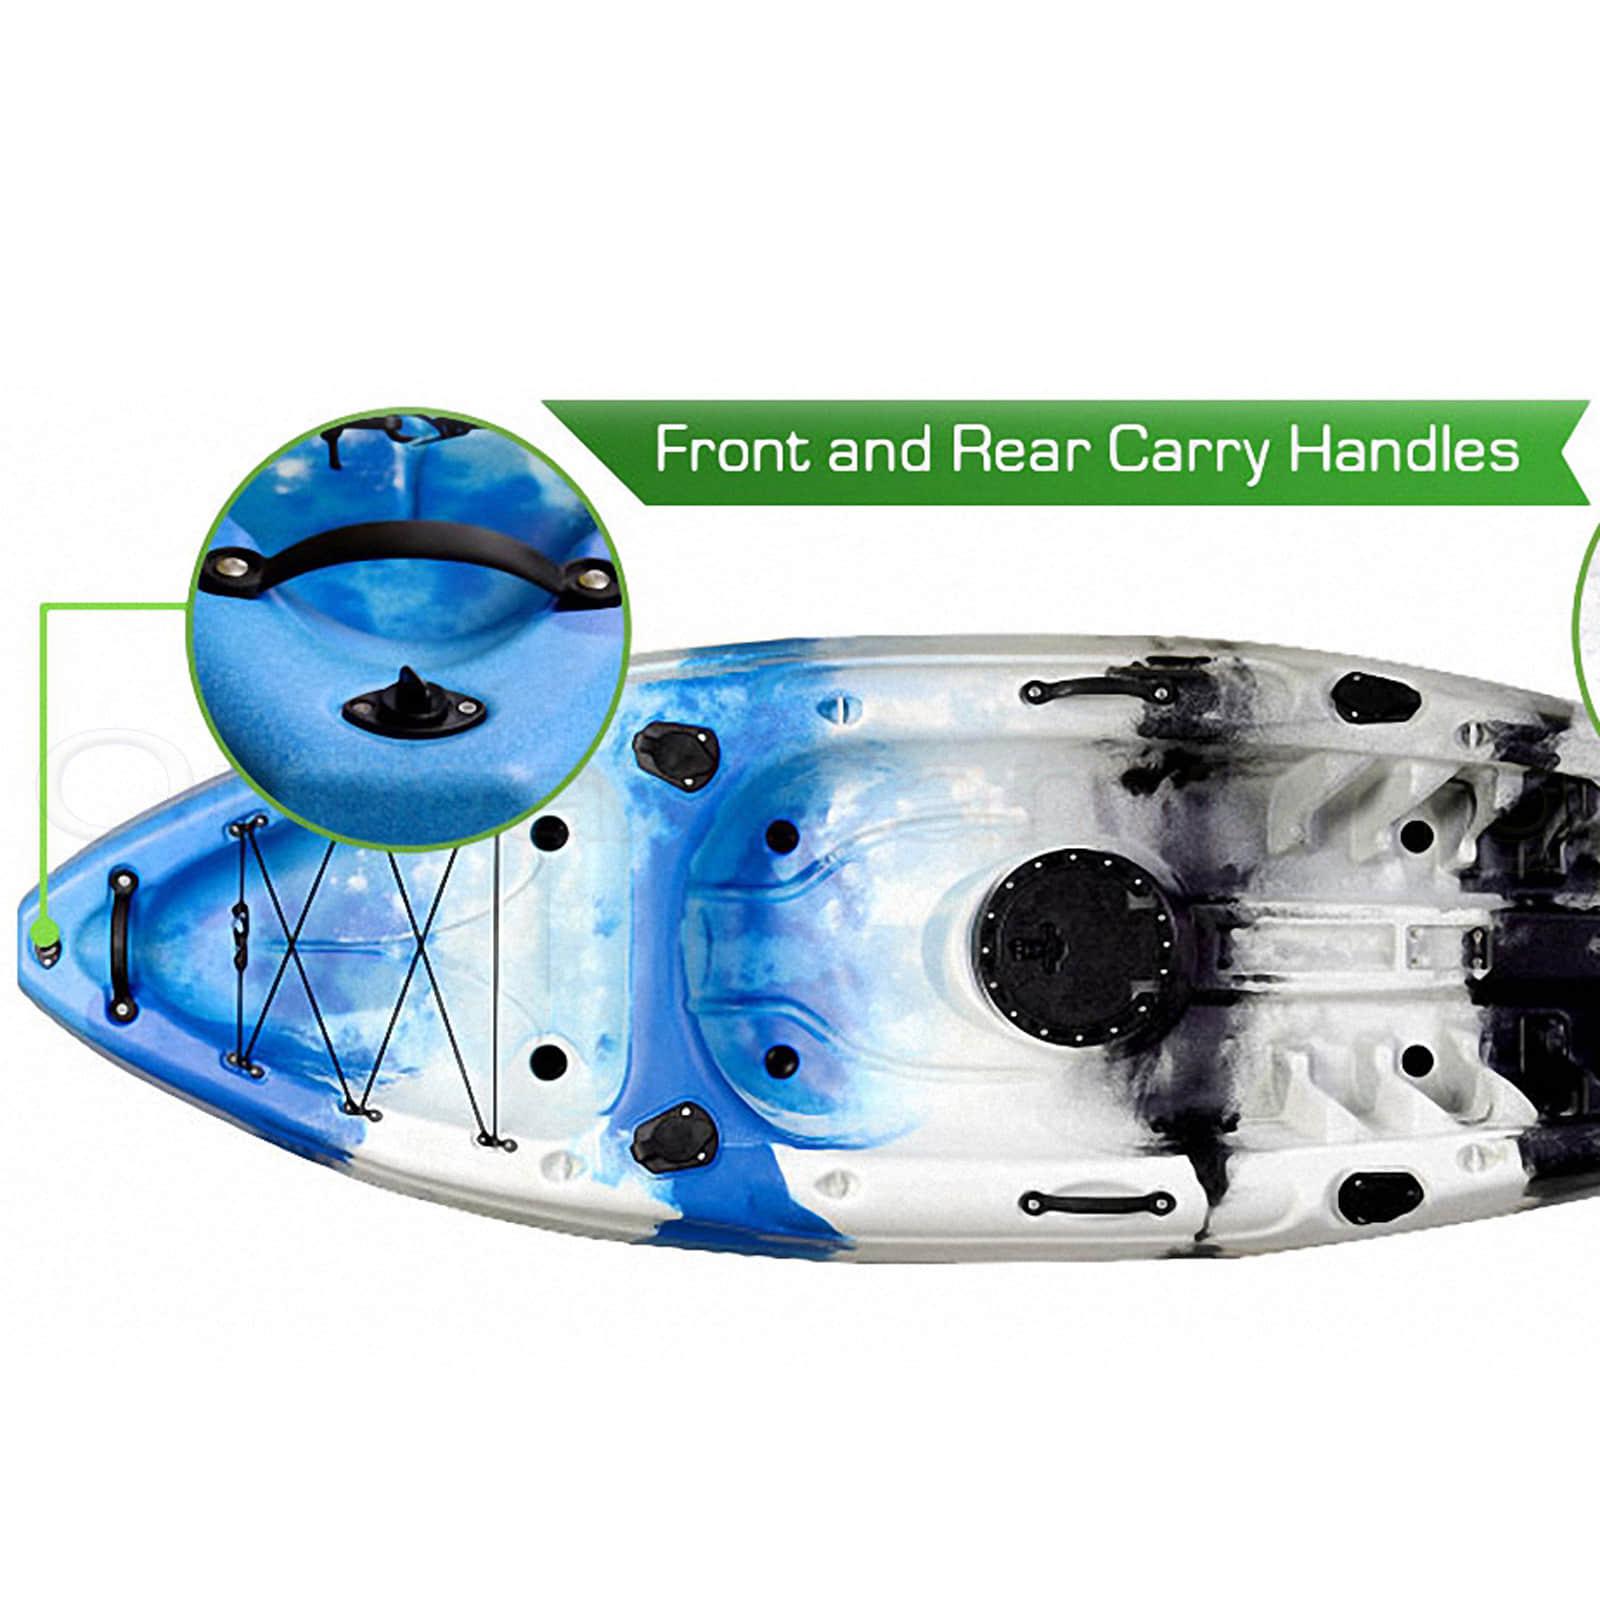 Single Fishing Kayak Sit On 5 Rod Holders Ocean Sea Canoe Camo Blue White Paddle